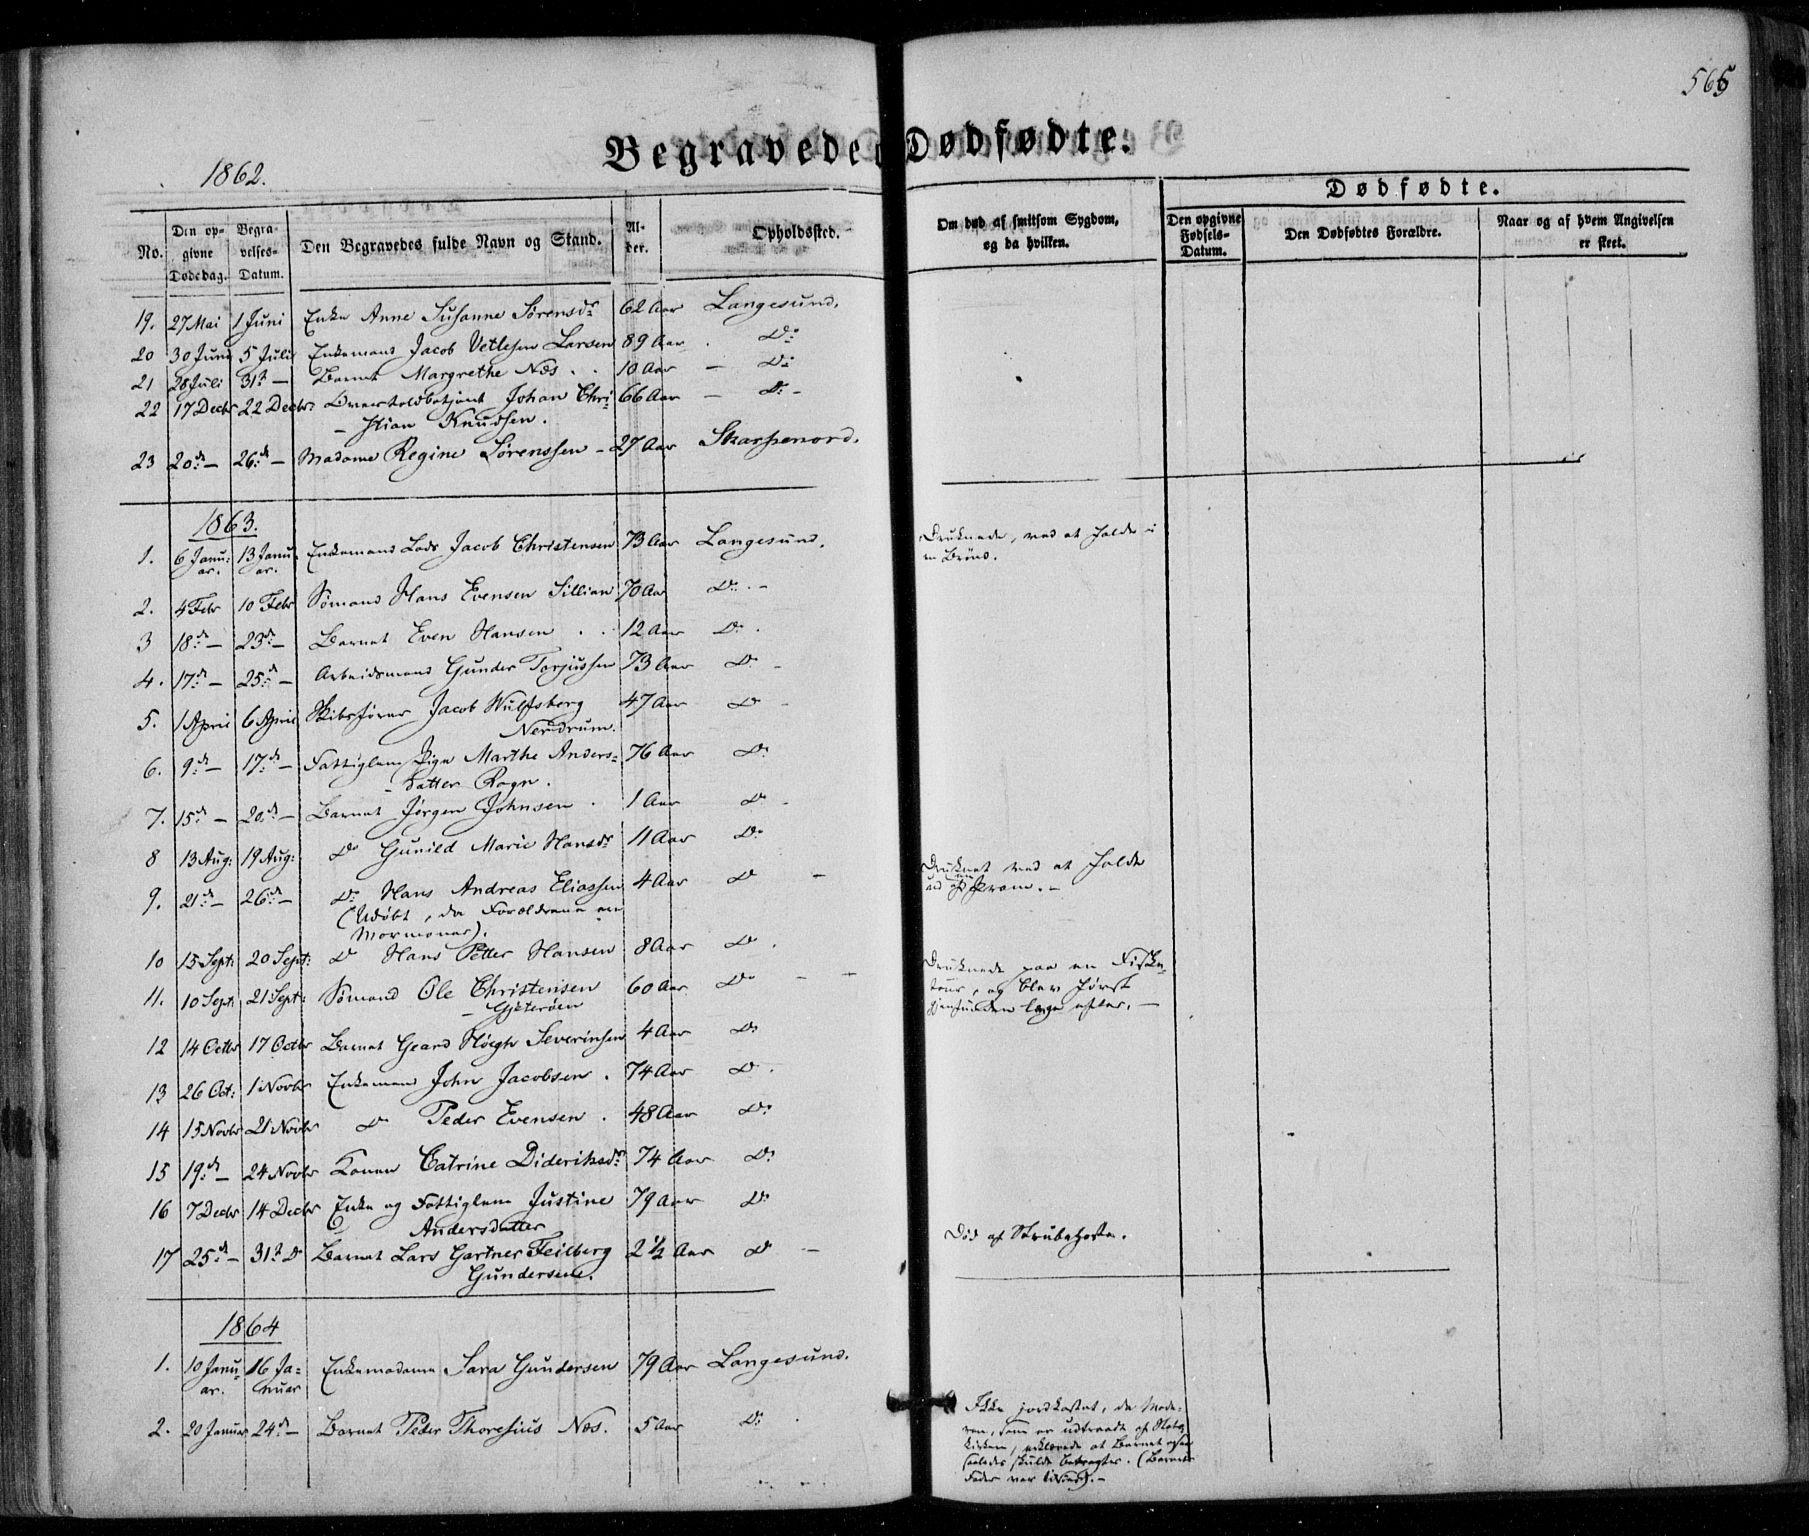 SAKO, Bamble kirkebøker, F/Fa/L0005: Ministerialbok nr. I 5, 1854-1869, s. 565